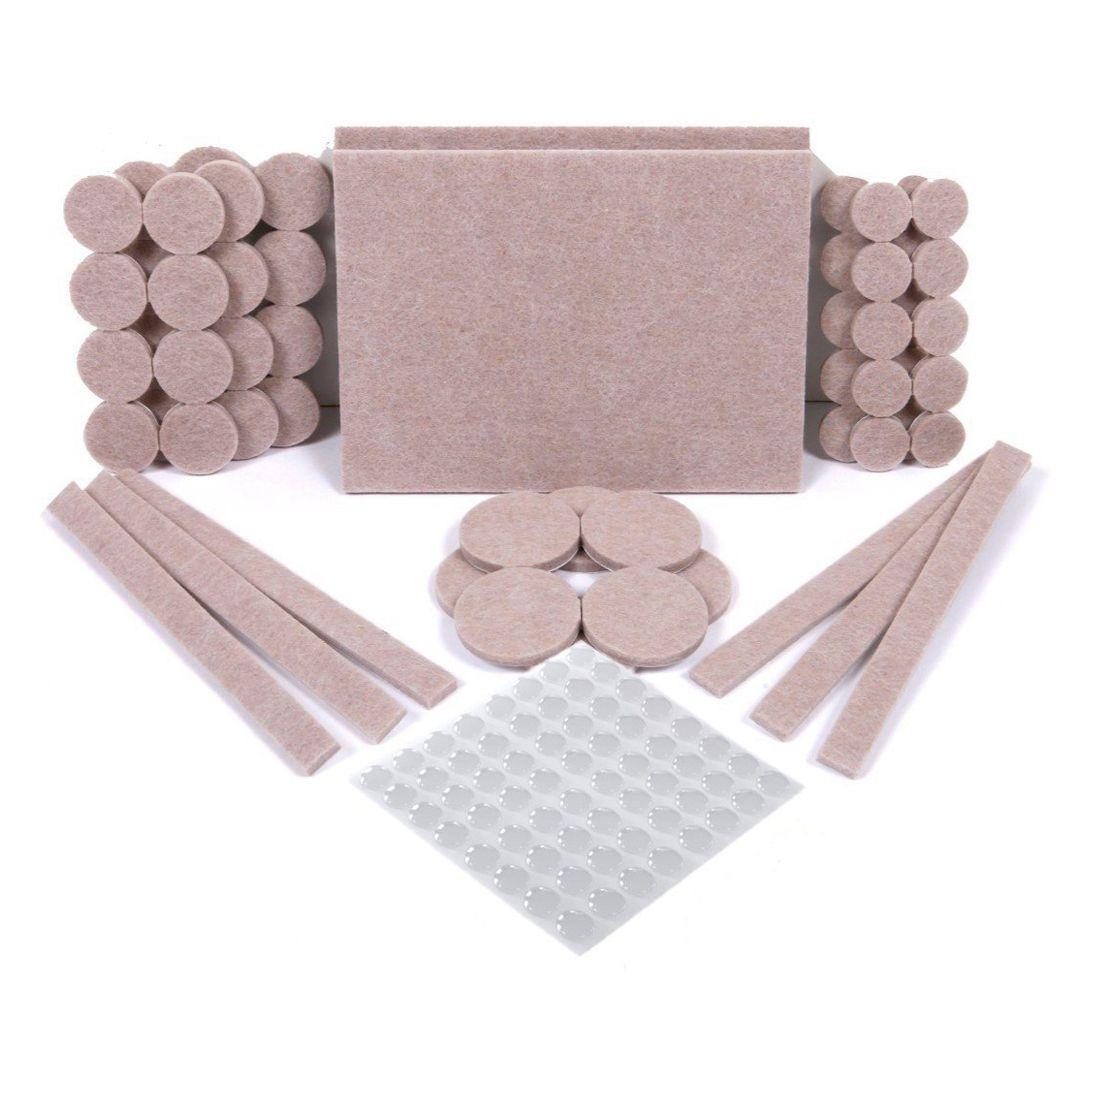 HOT SALE 124 pcs-60 Self Stick Furniture Felt Pads For Hardwood Floors&64 Noise Dampening Rubber Bumper Pads